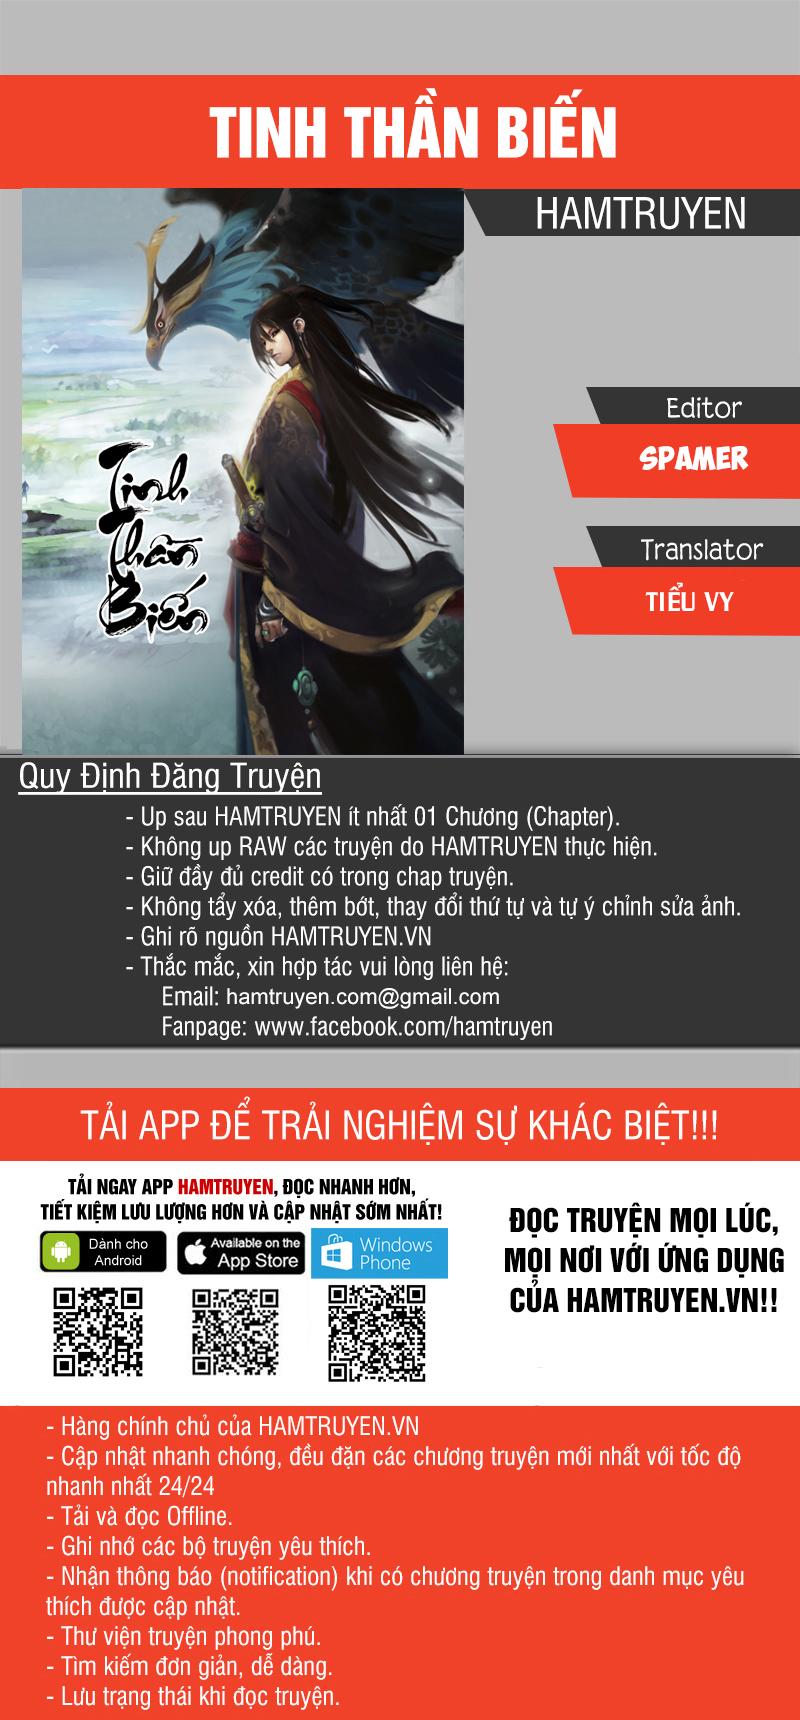 Tinh Thần Biến Chapter 453 - Upload bởi truyensieuhay.com